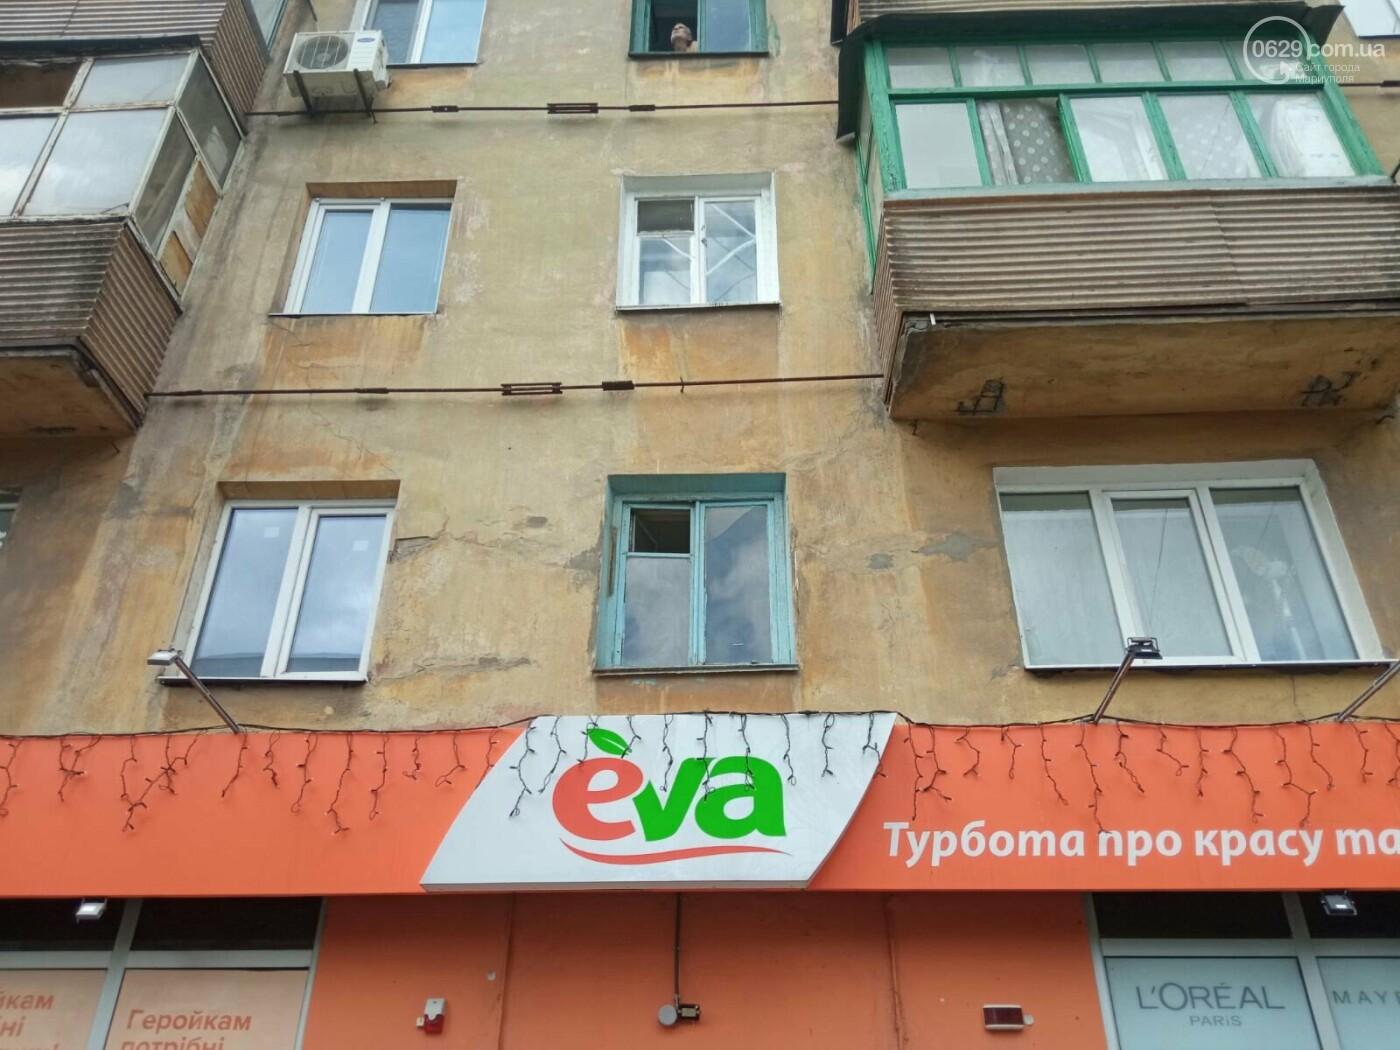 Соседи в ужасе! Бомжи и наркоманы захватили пустующую квартиру в Мариуполе и устроили притон, - ФОТО, фото-1